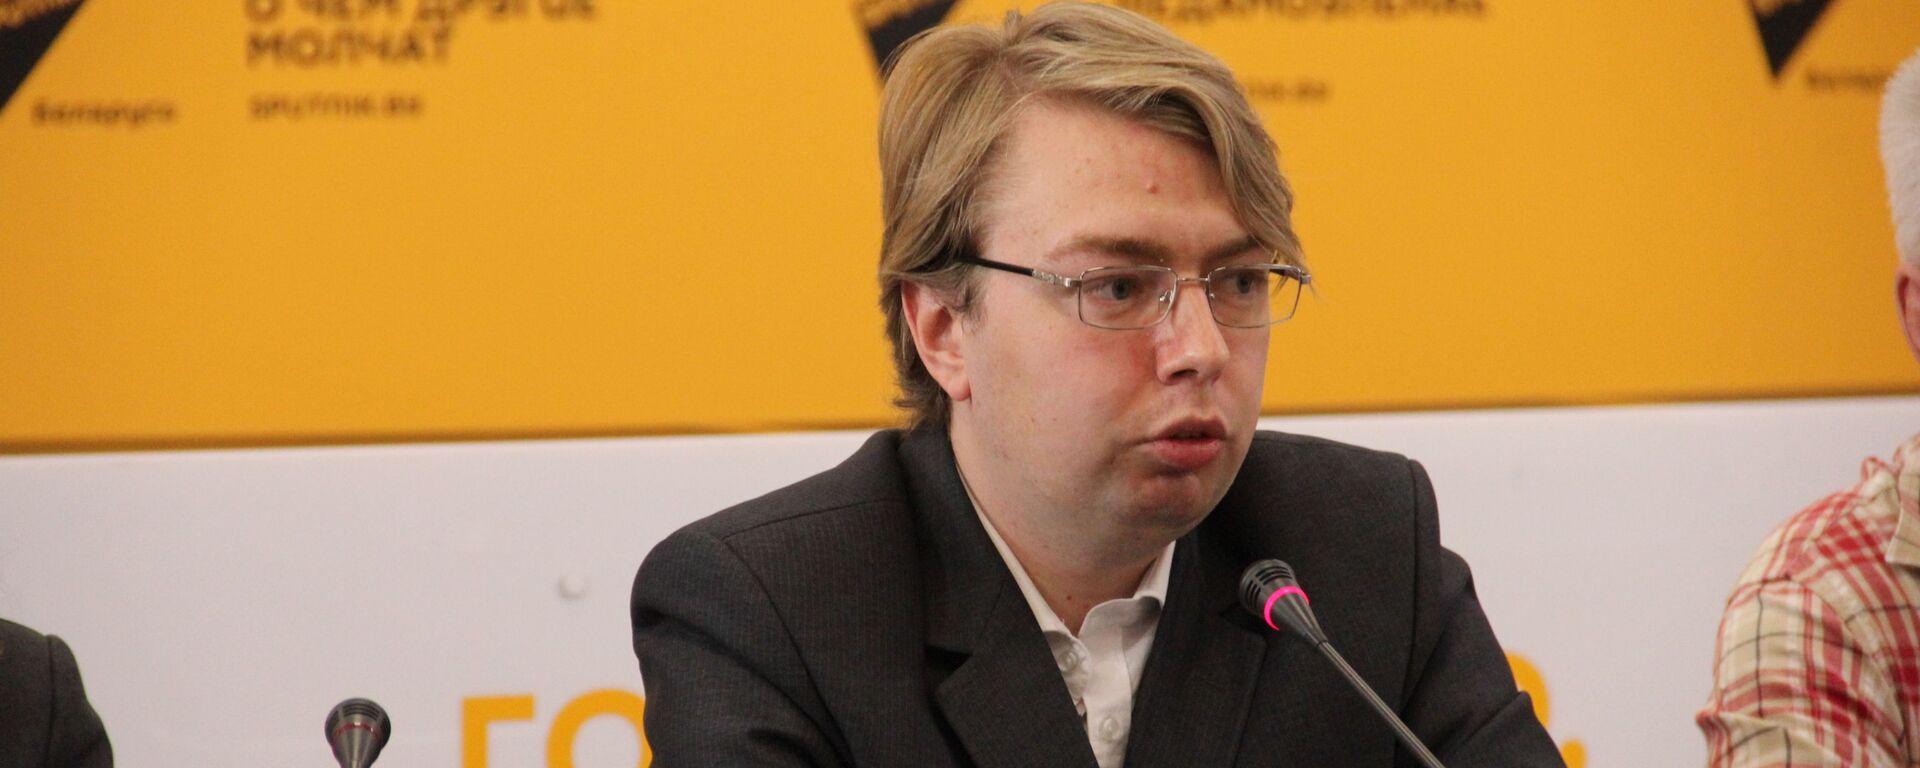 Политолог Александр Носович на круглом столе в пресс-центре Sputnik  - Sputnik Беларусь, 1920, 25.05.2021